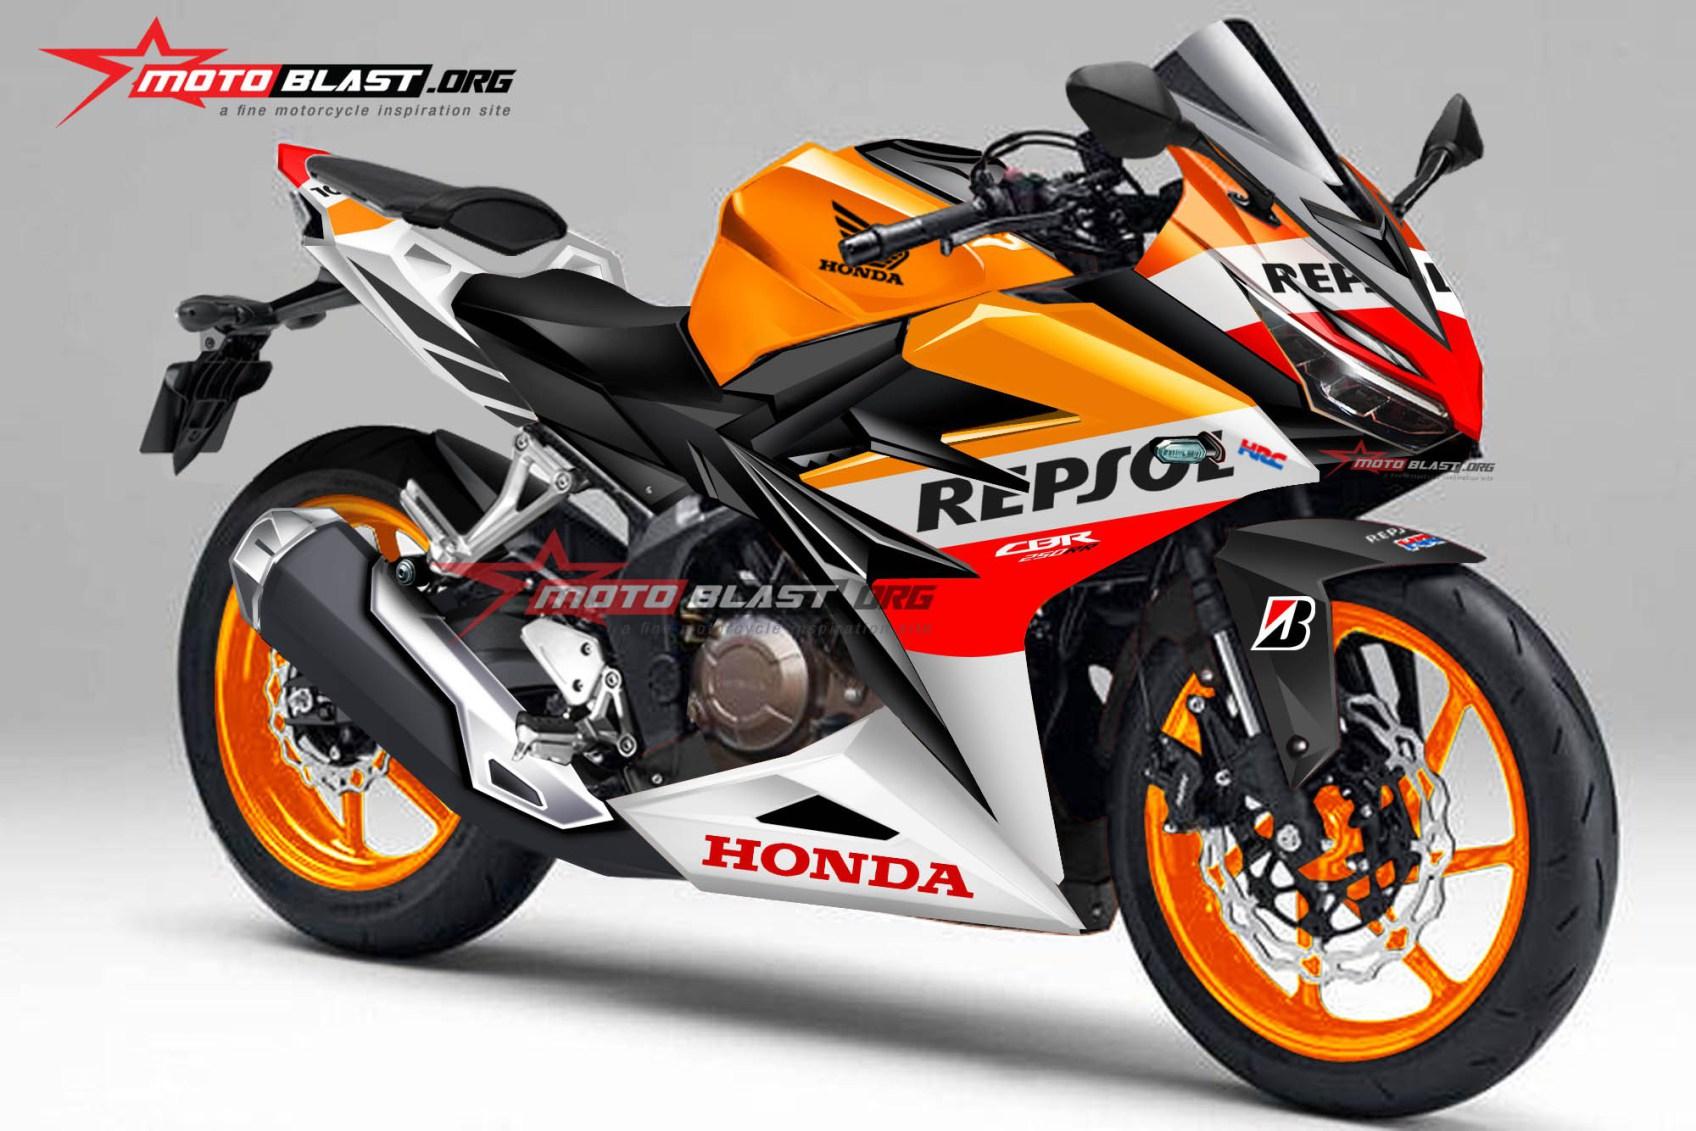 Koleksi Modifikasi Motor New Honda Blade Repsol Terlengkap Krezek